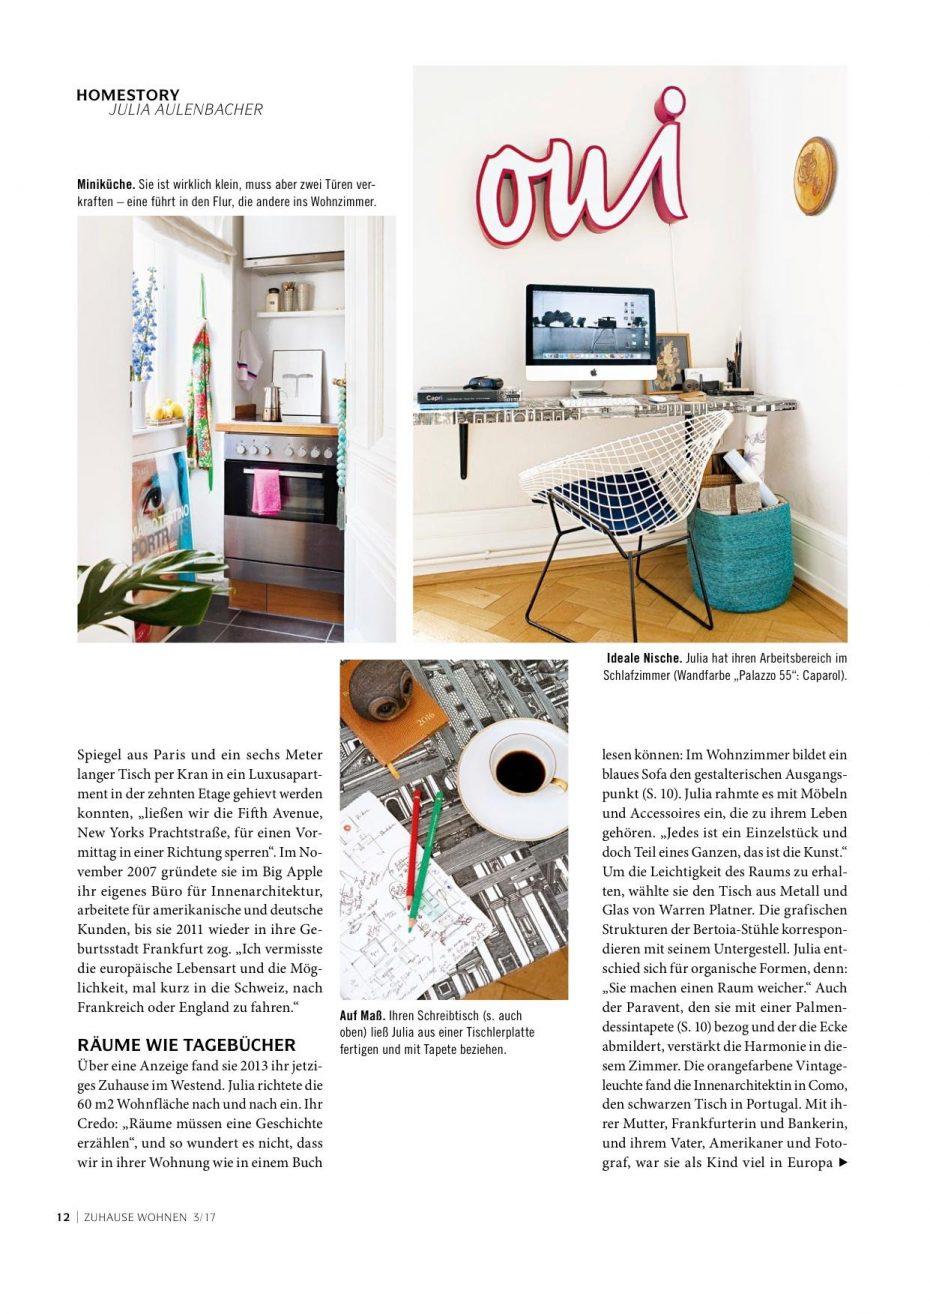 Julia Aulenbacher - Interiors +++ zu Hause wohnen 2